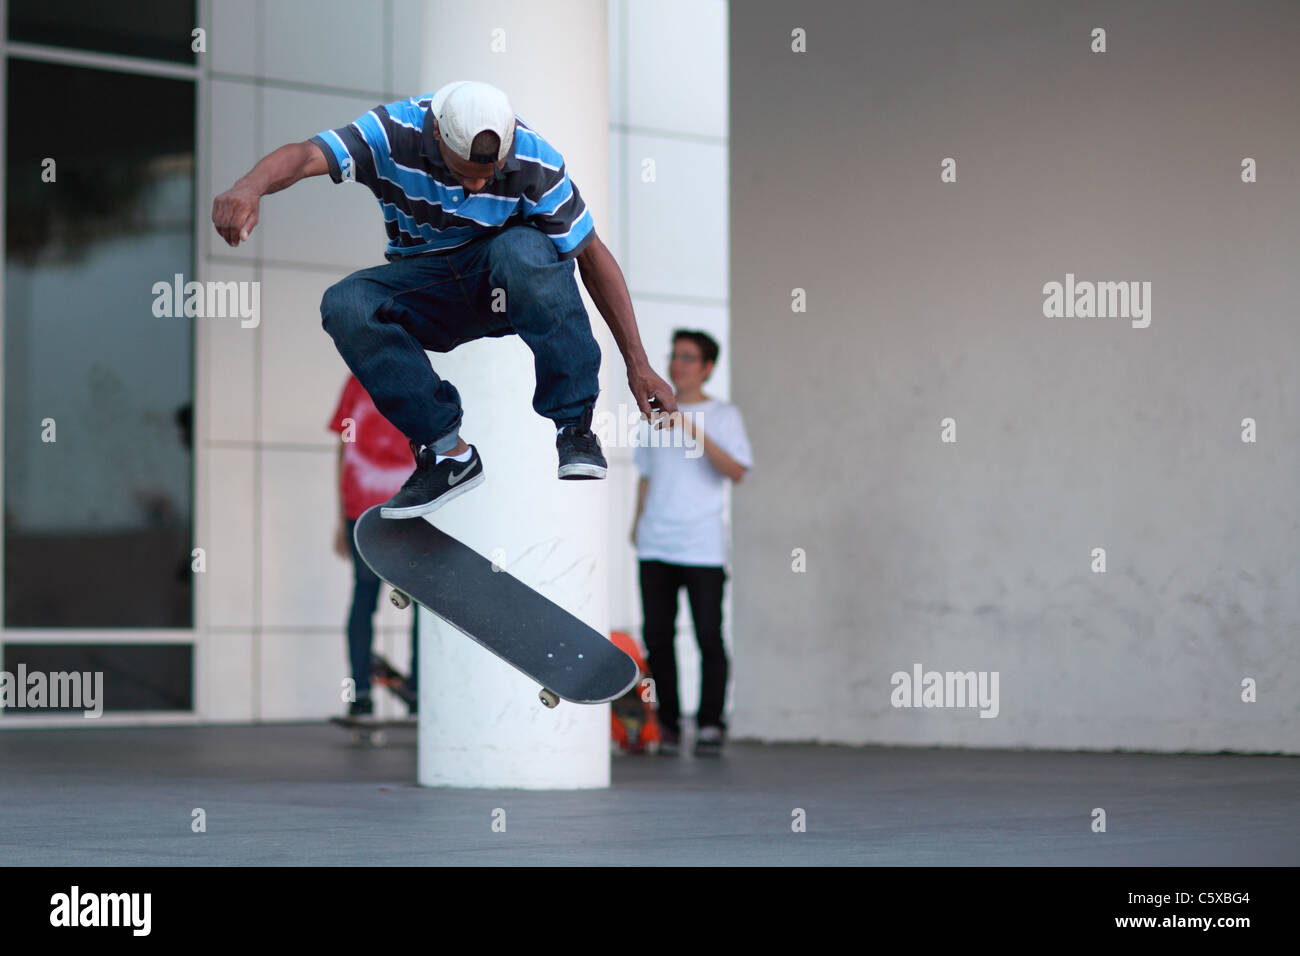 Acrobazie Skateboard Tricks salta Immagini Stock